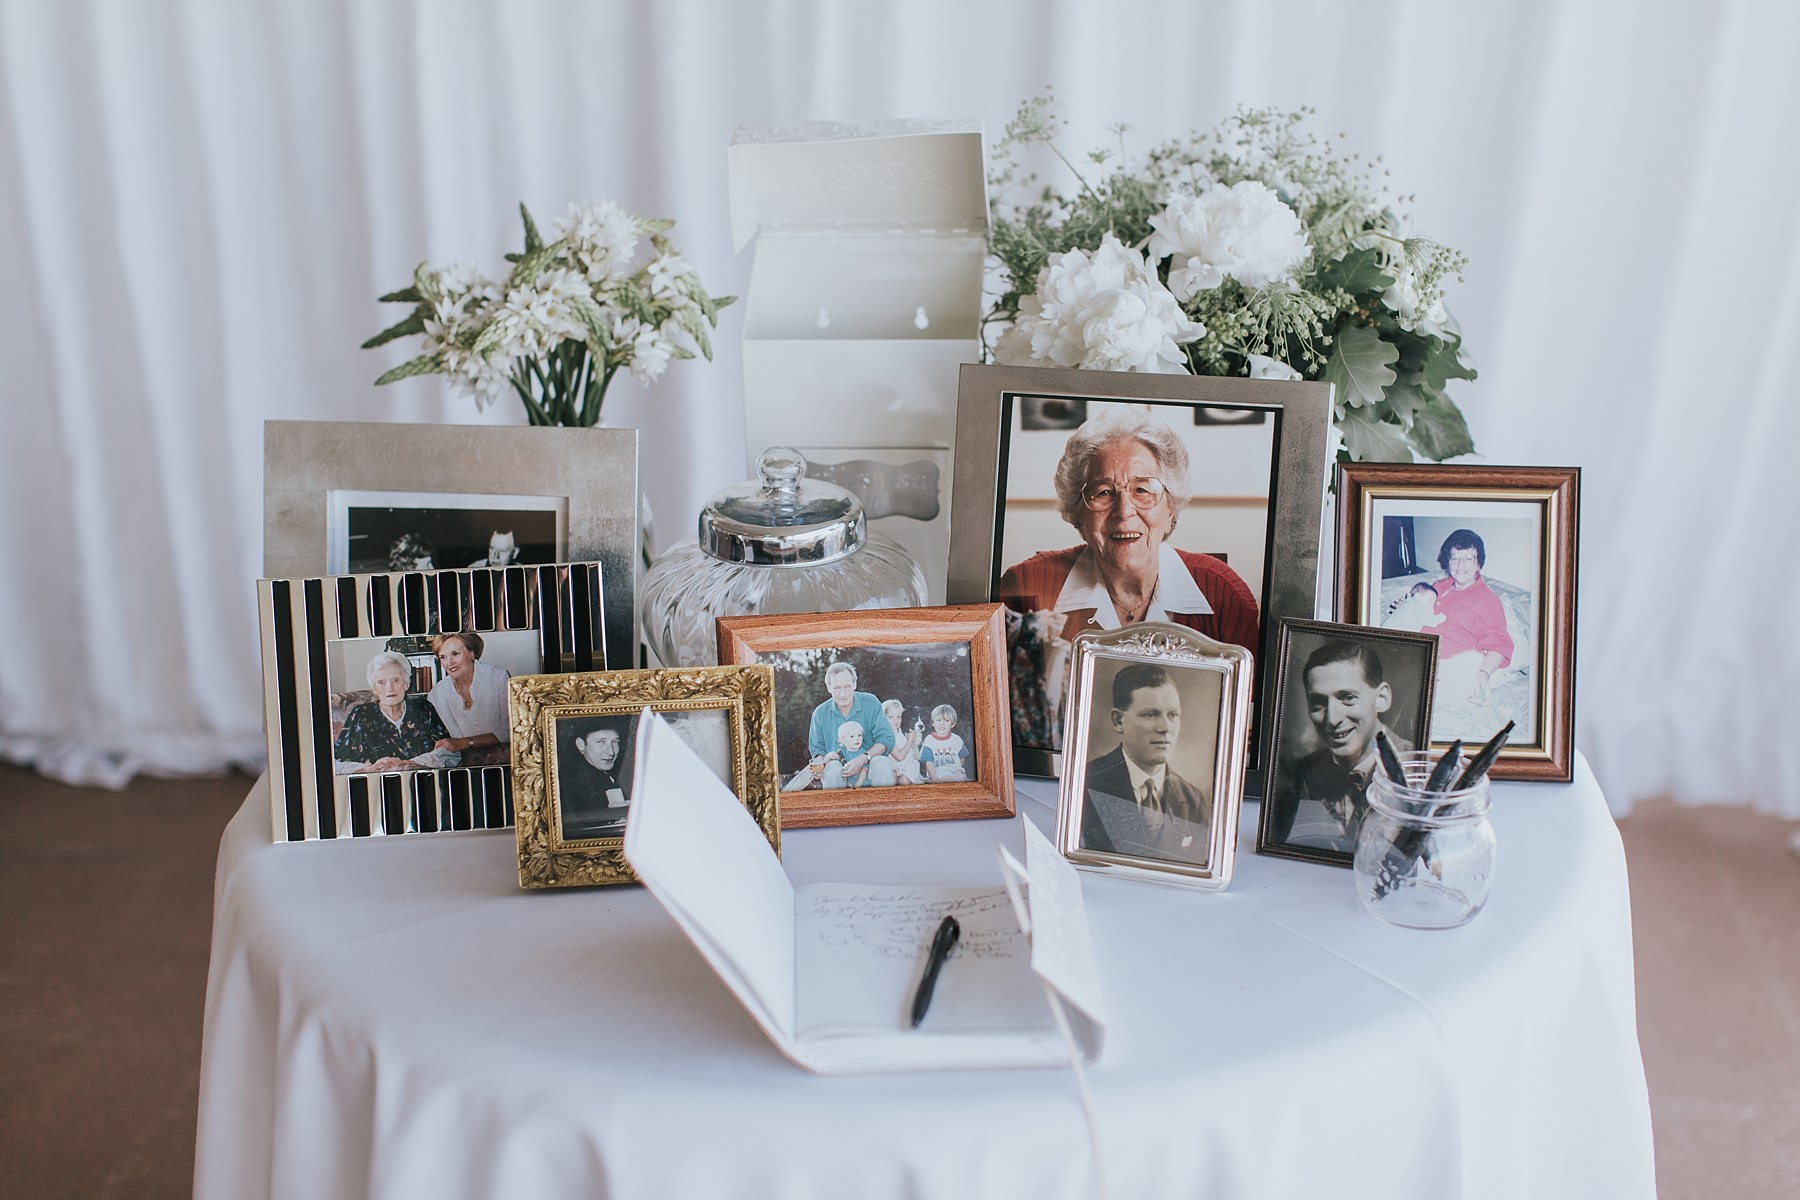 grandparents framed photos at wedding reception